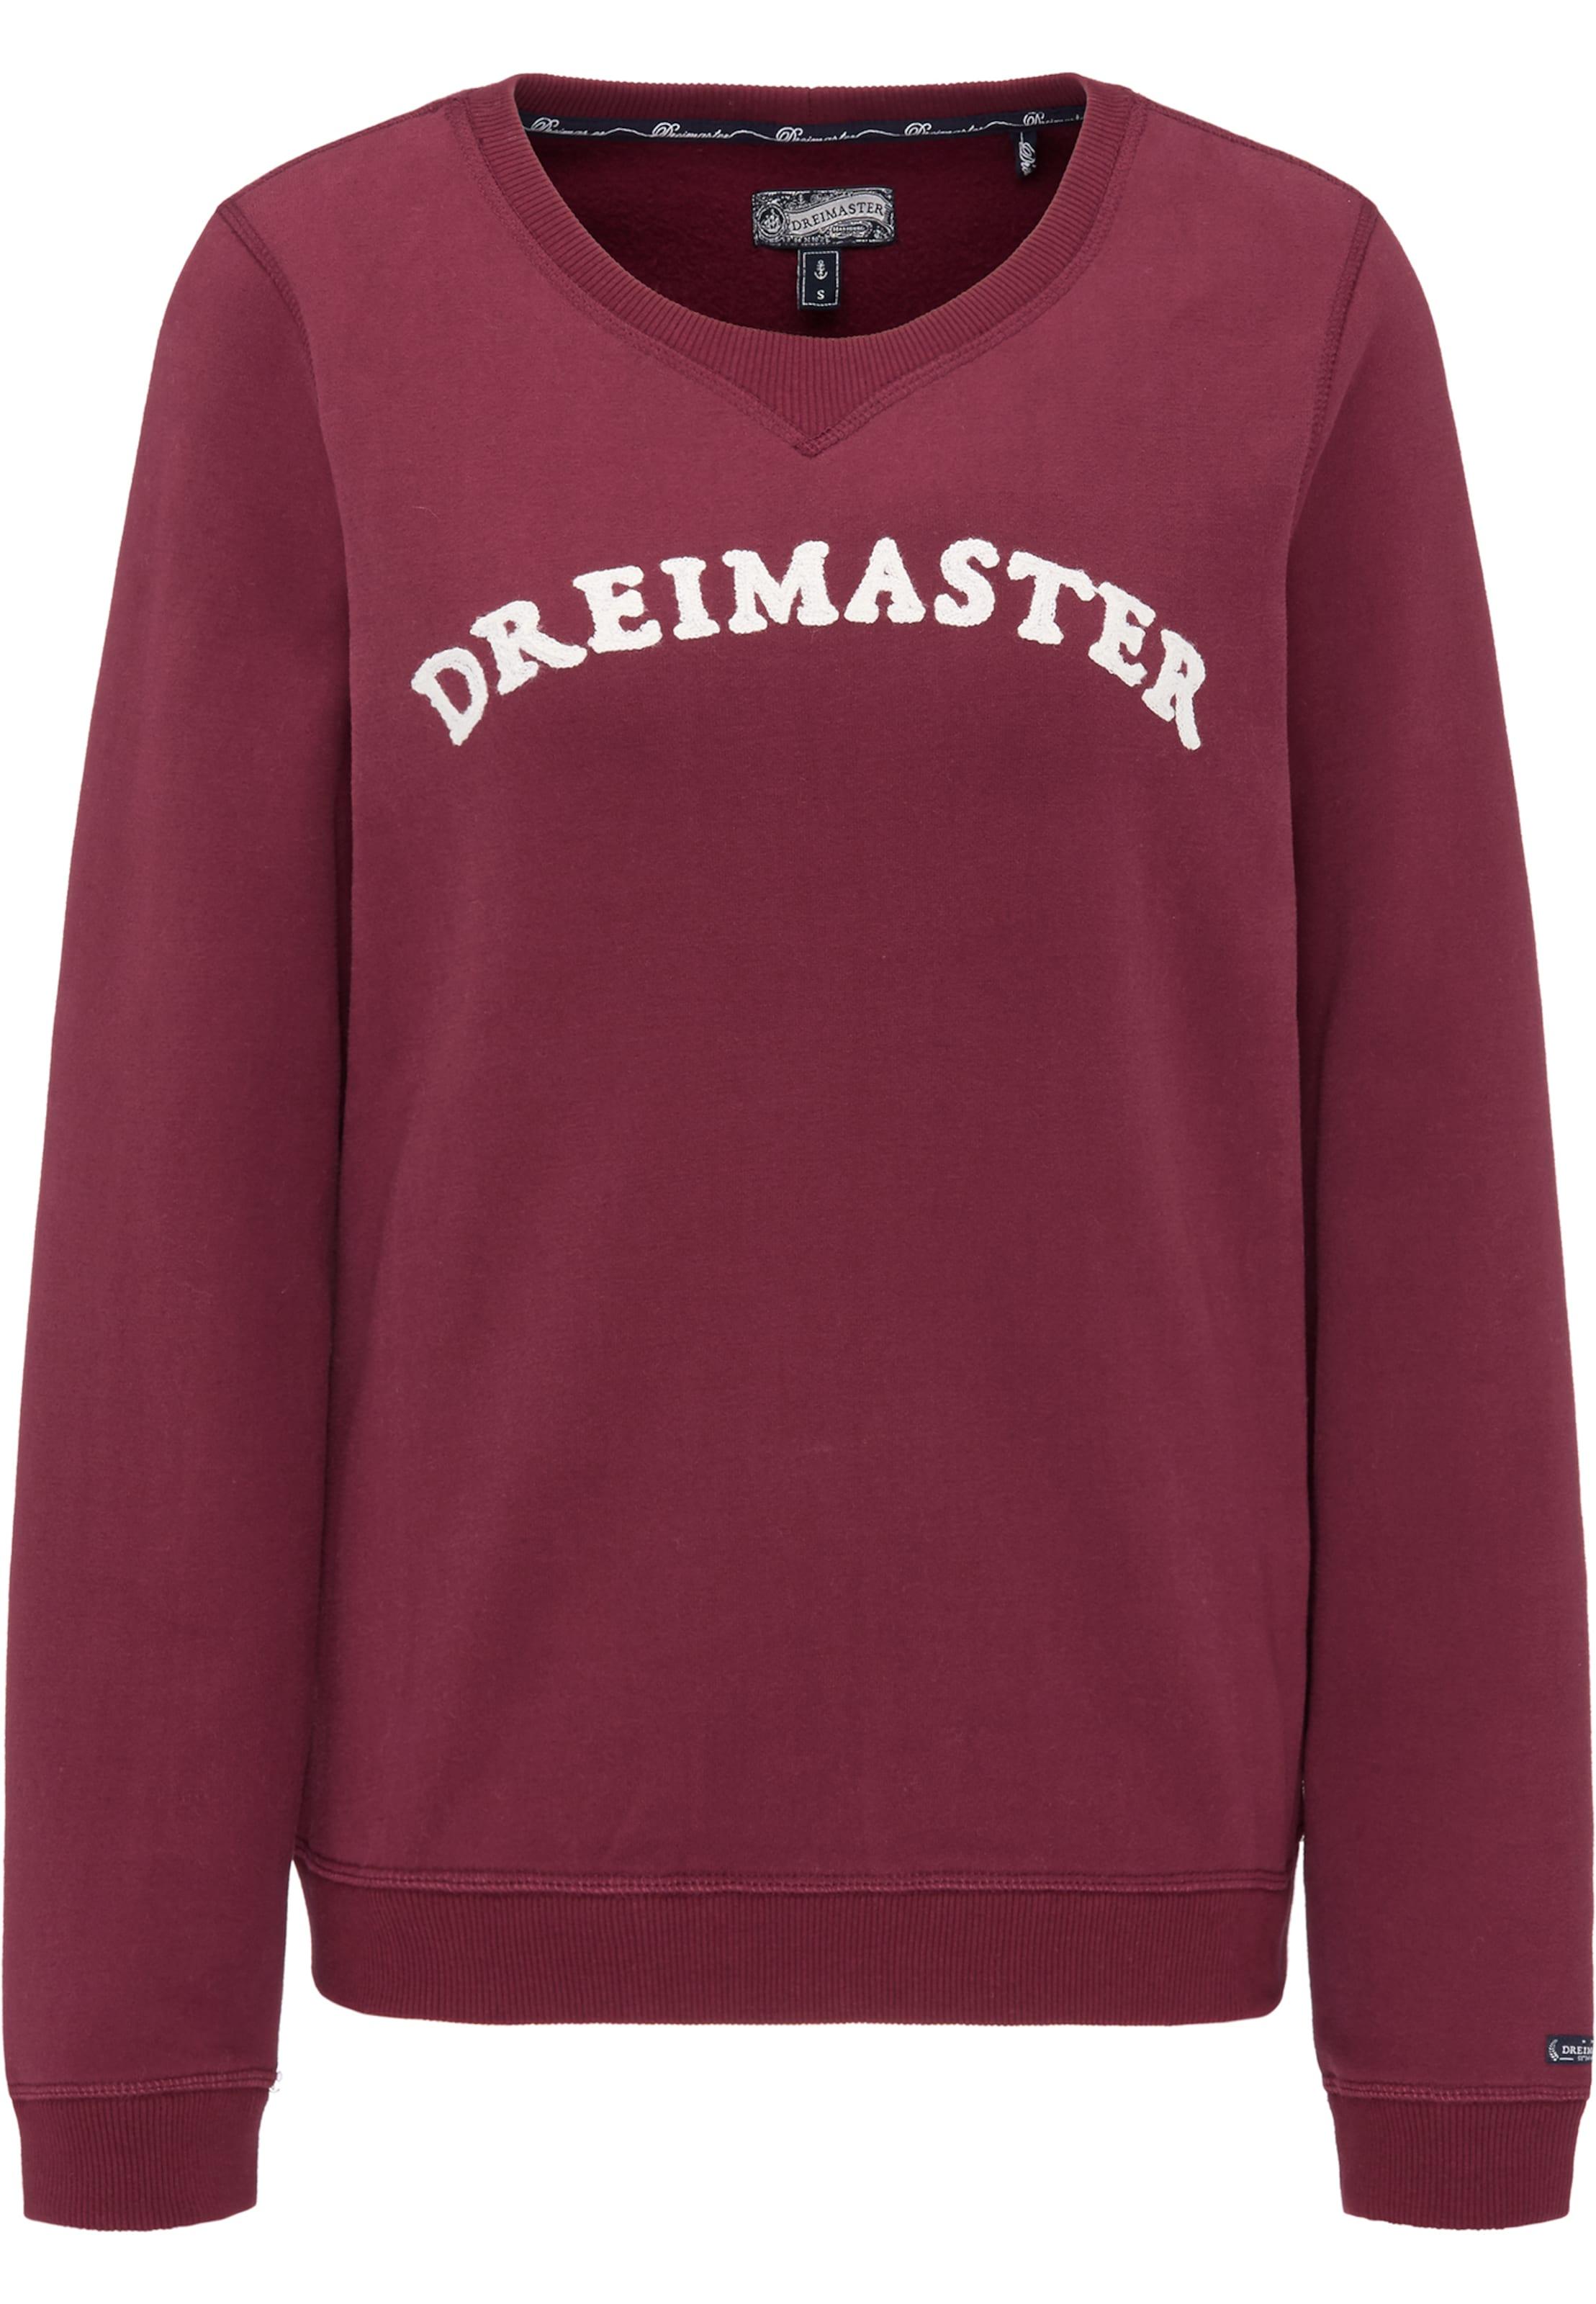 Rouge Foncé shirt Dreimaster En Sweat 1clKJF